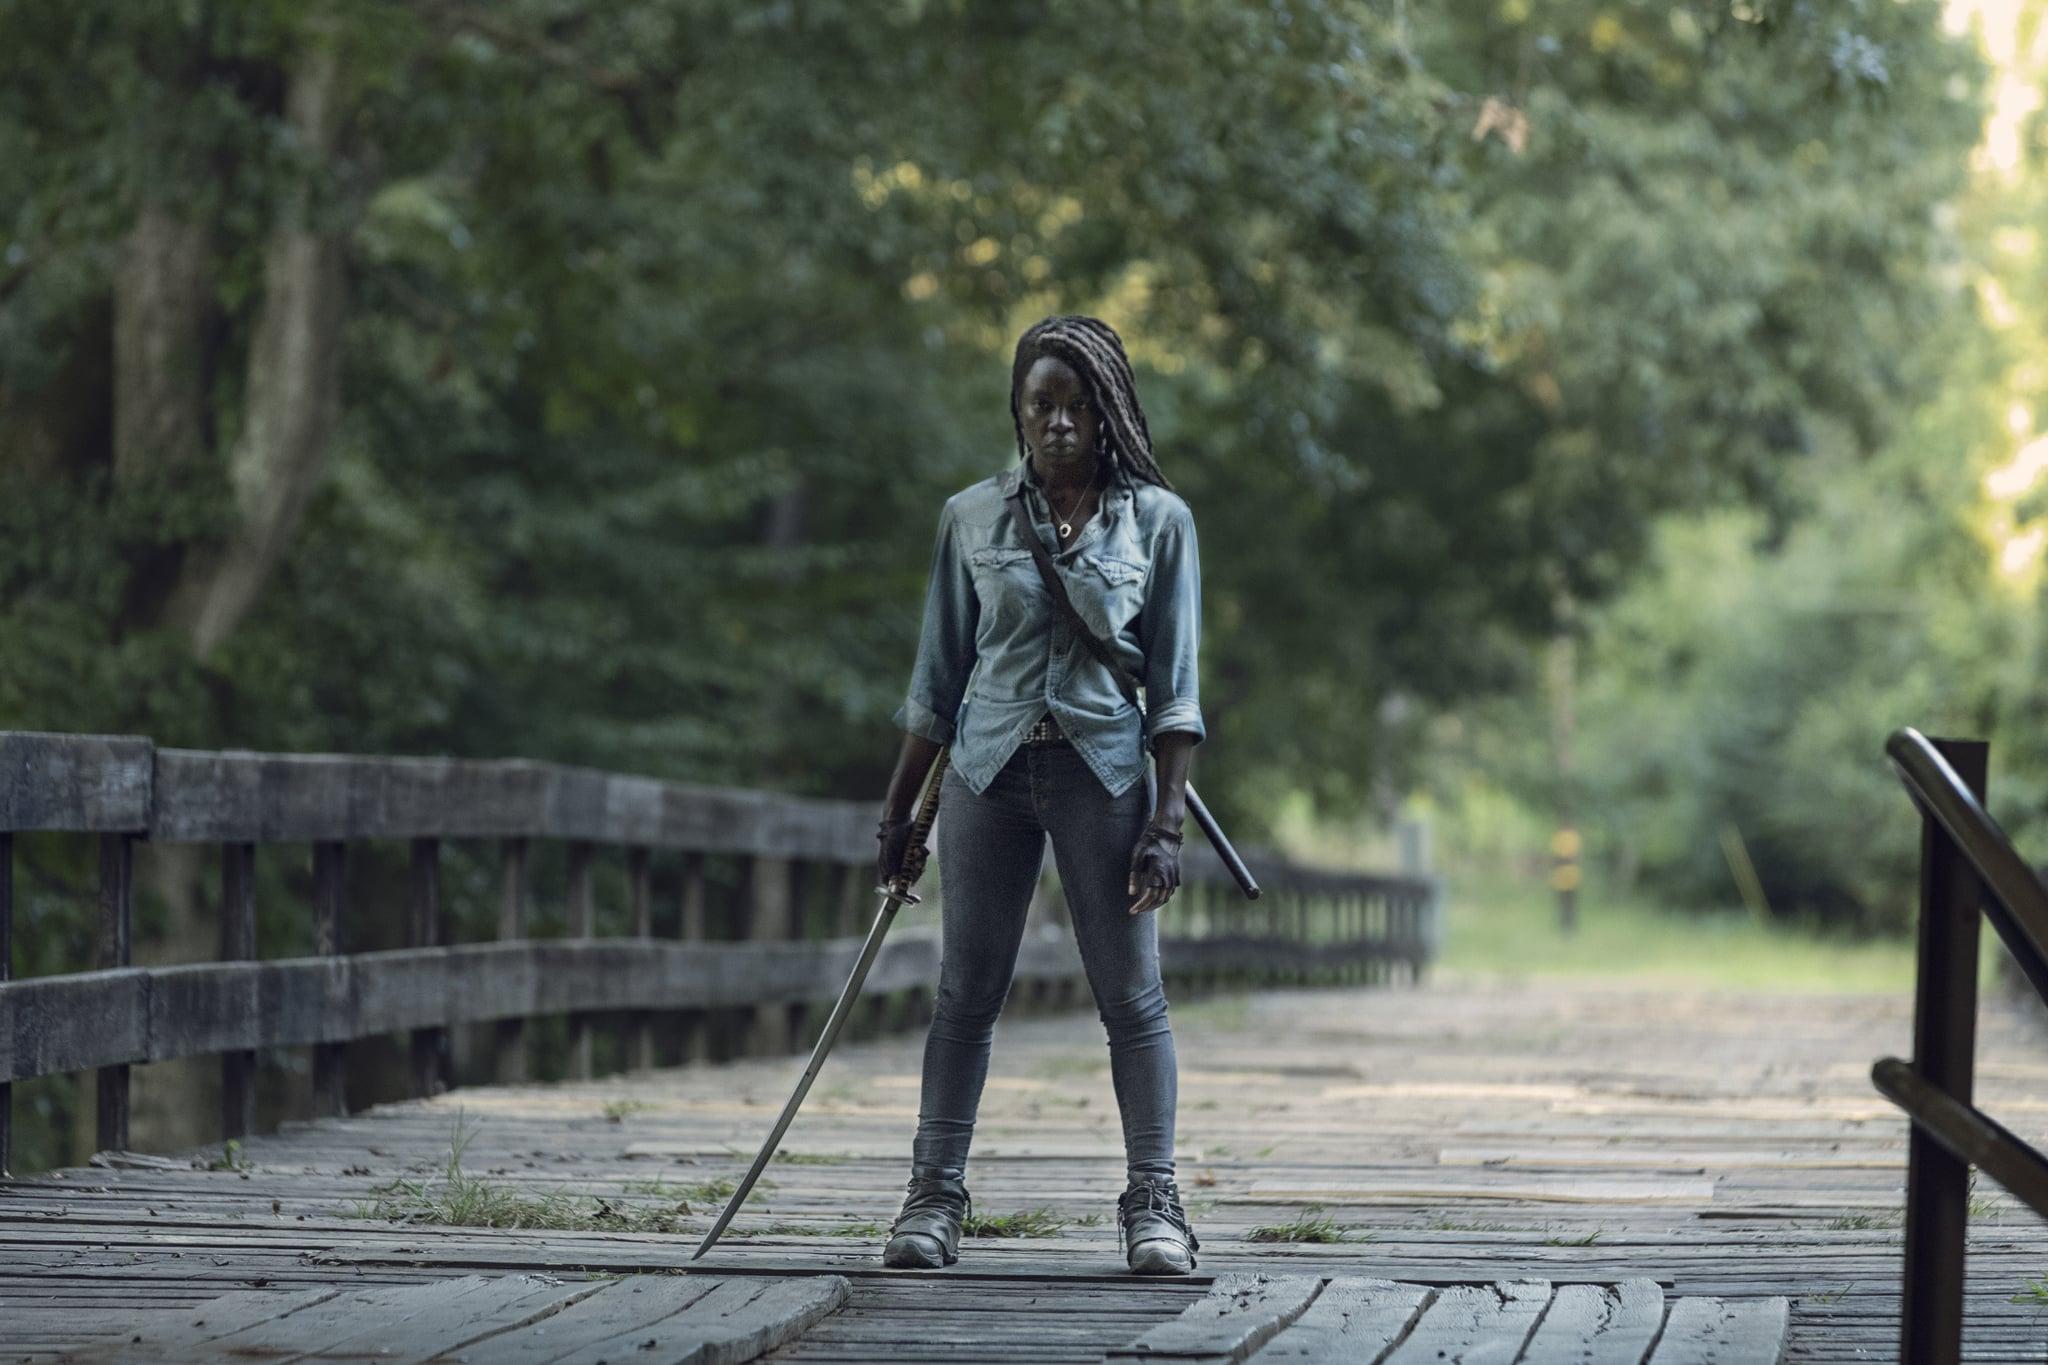 Danai Gurira as Michonne - The Walking Dead _ Season 9, Episode 9 - Photo Credit: Jackson Lee Davis/AMC